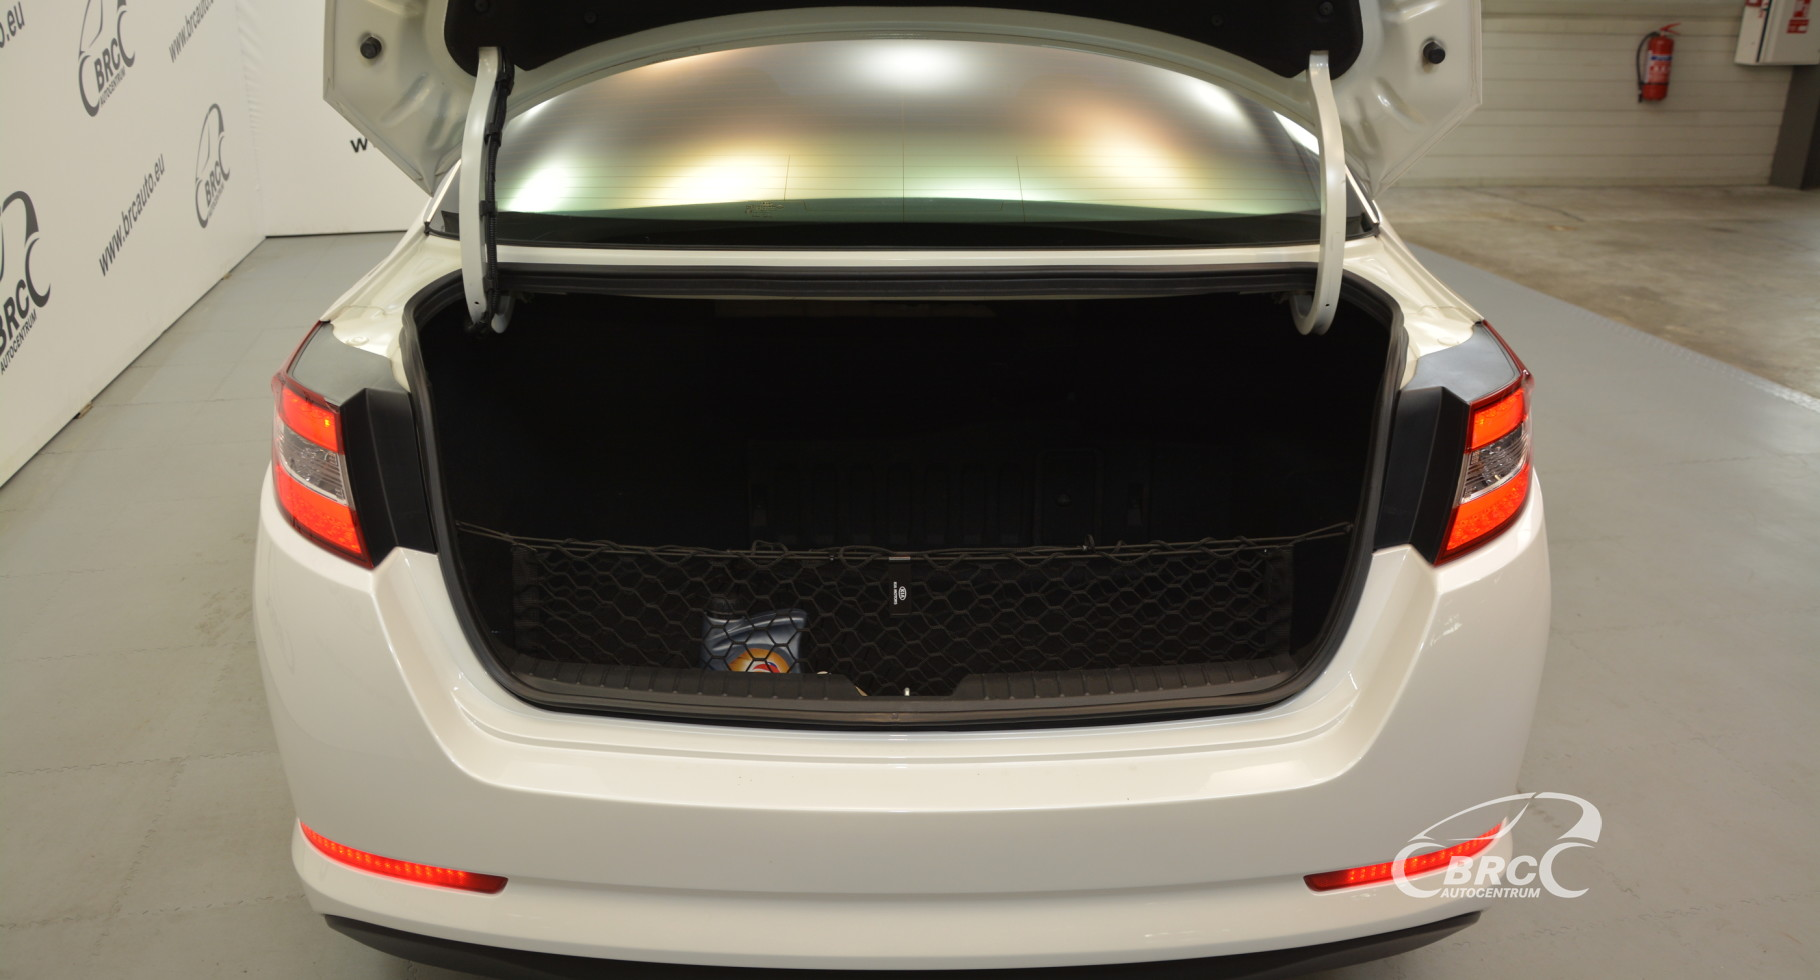 Kia Optima 2.4i eco Hybrid Automatas